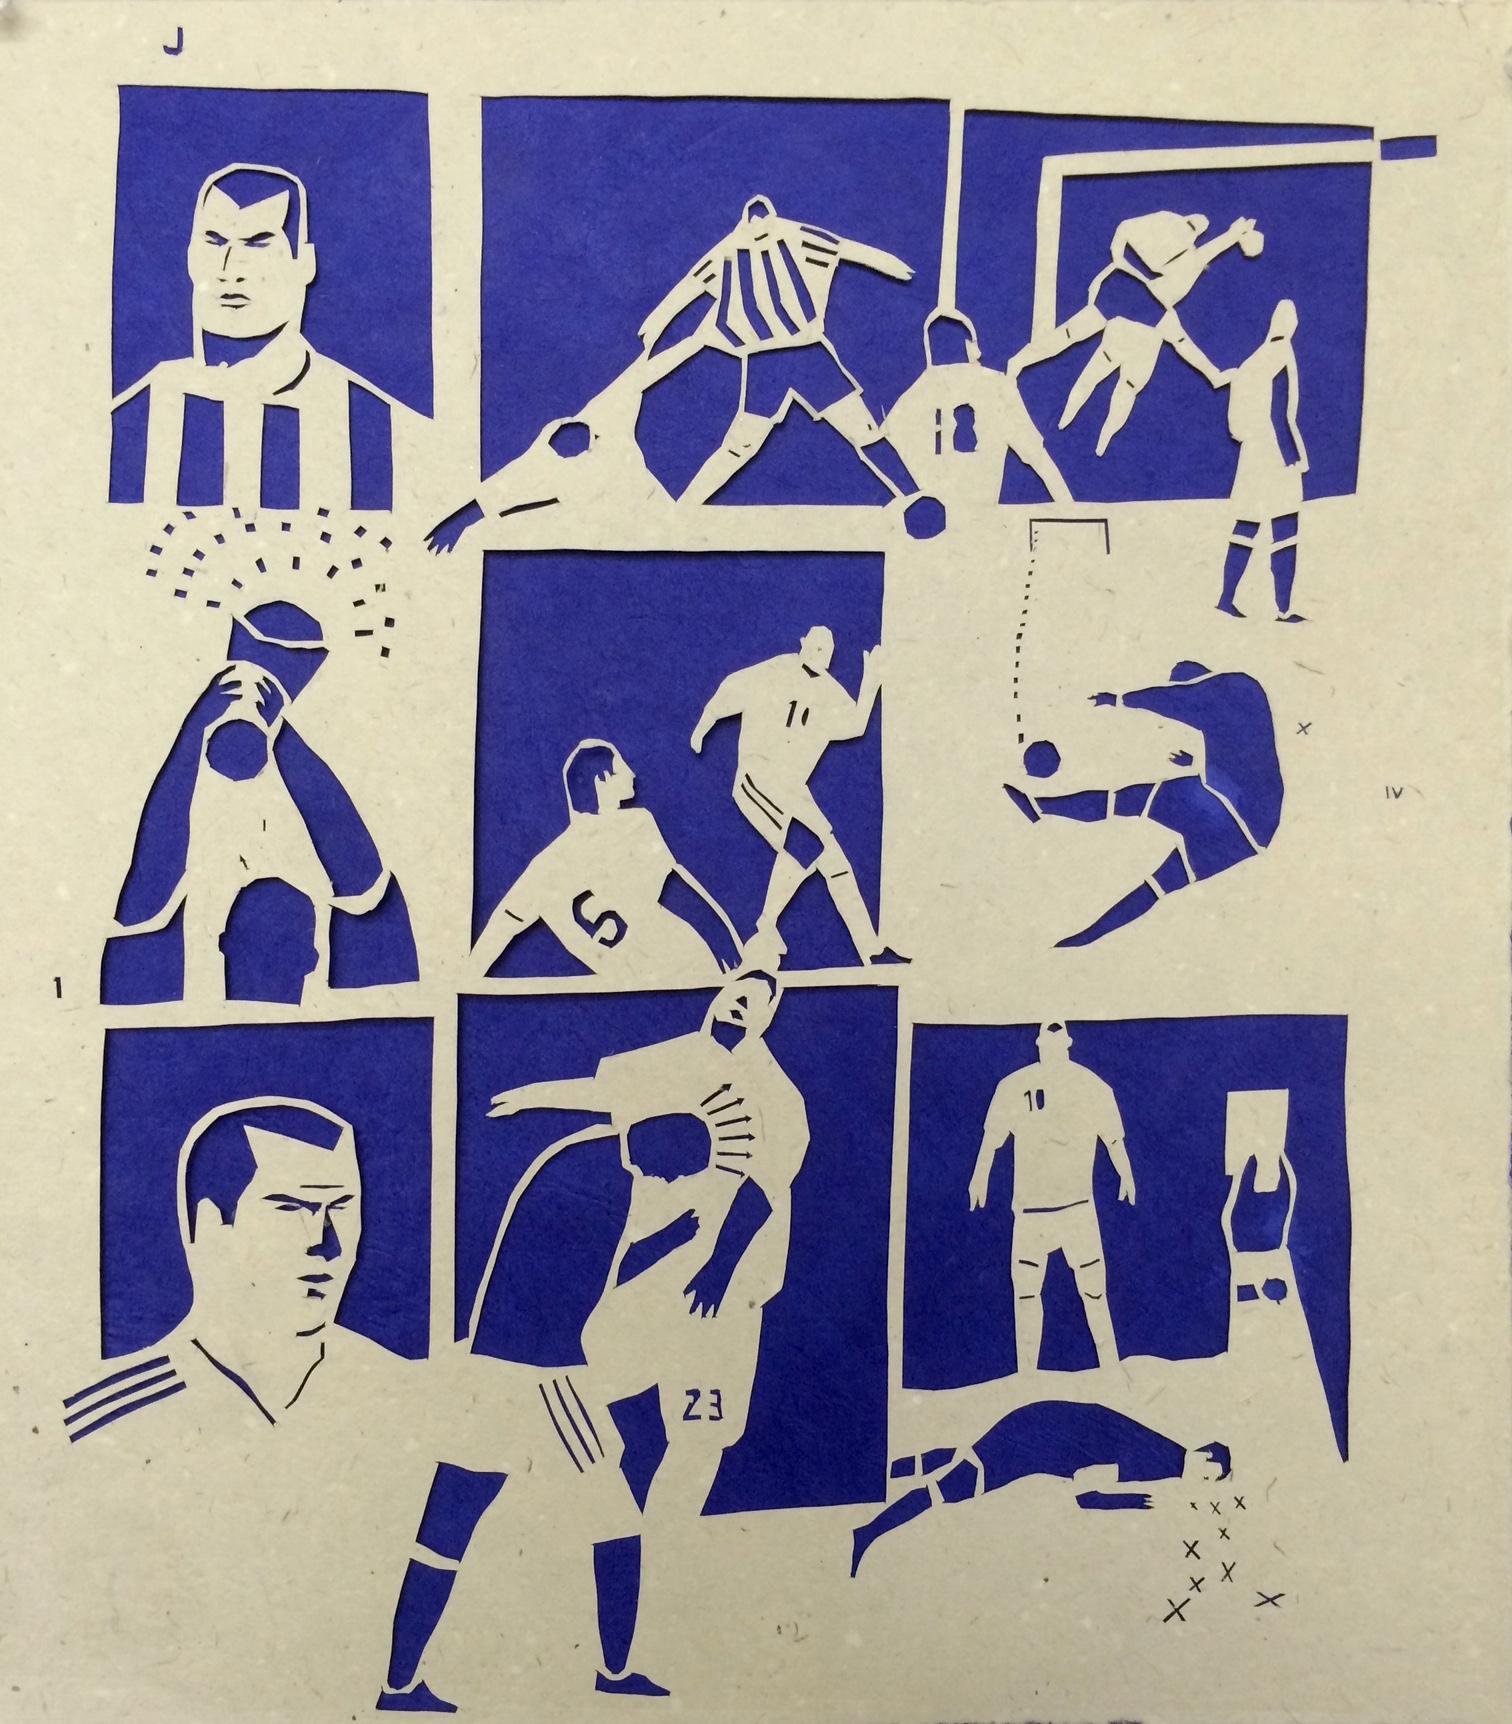 Case_Jernigan_Zidane